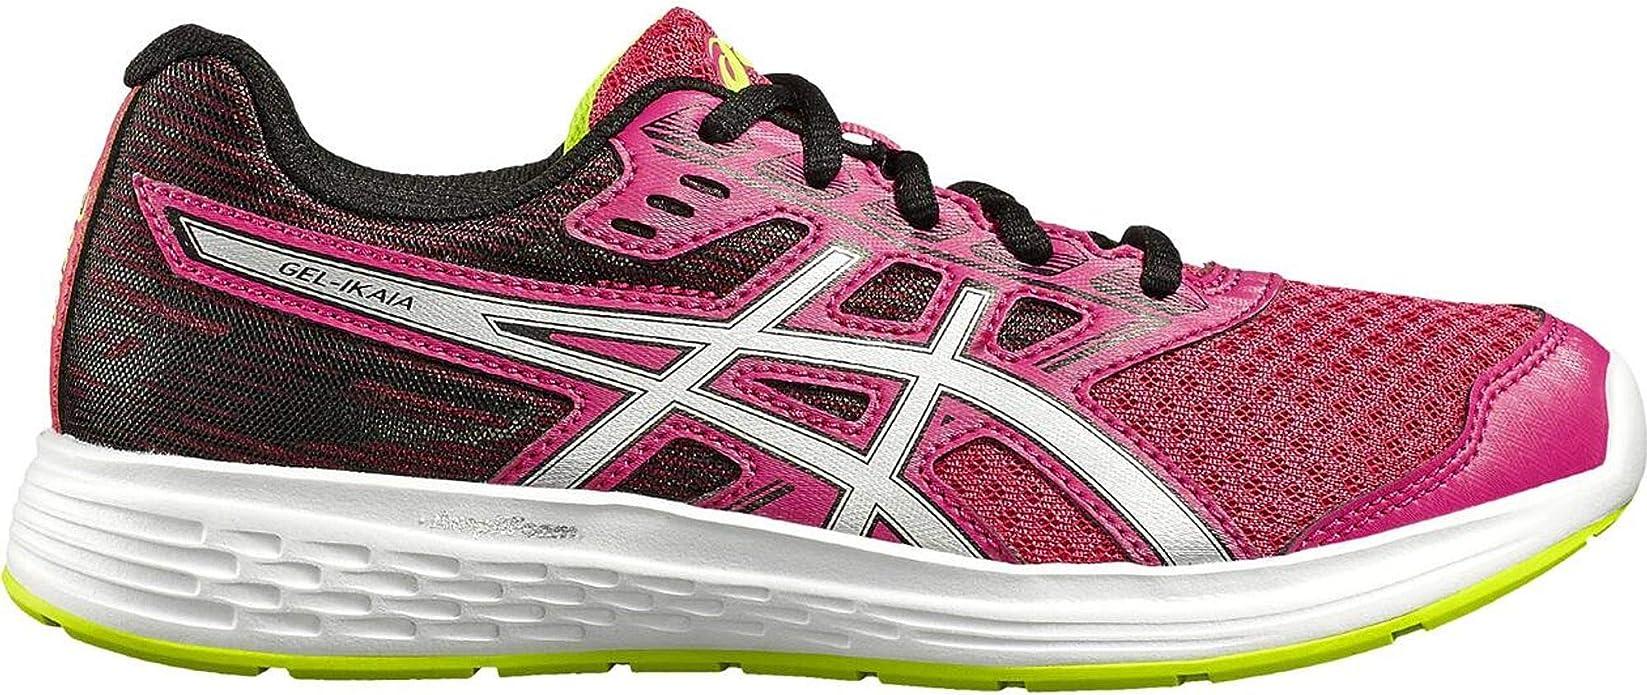 ASICS IKAIA 8 GS Running Shoes Pink (13